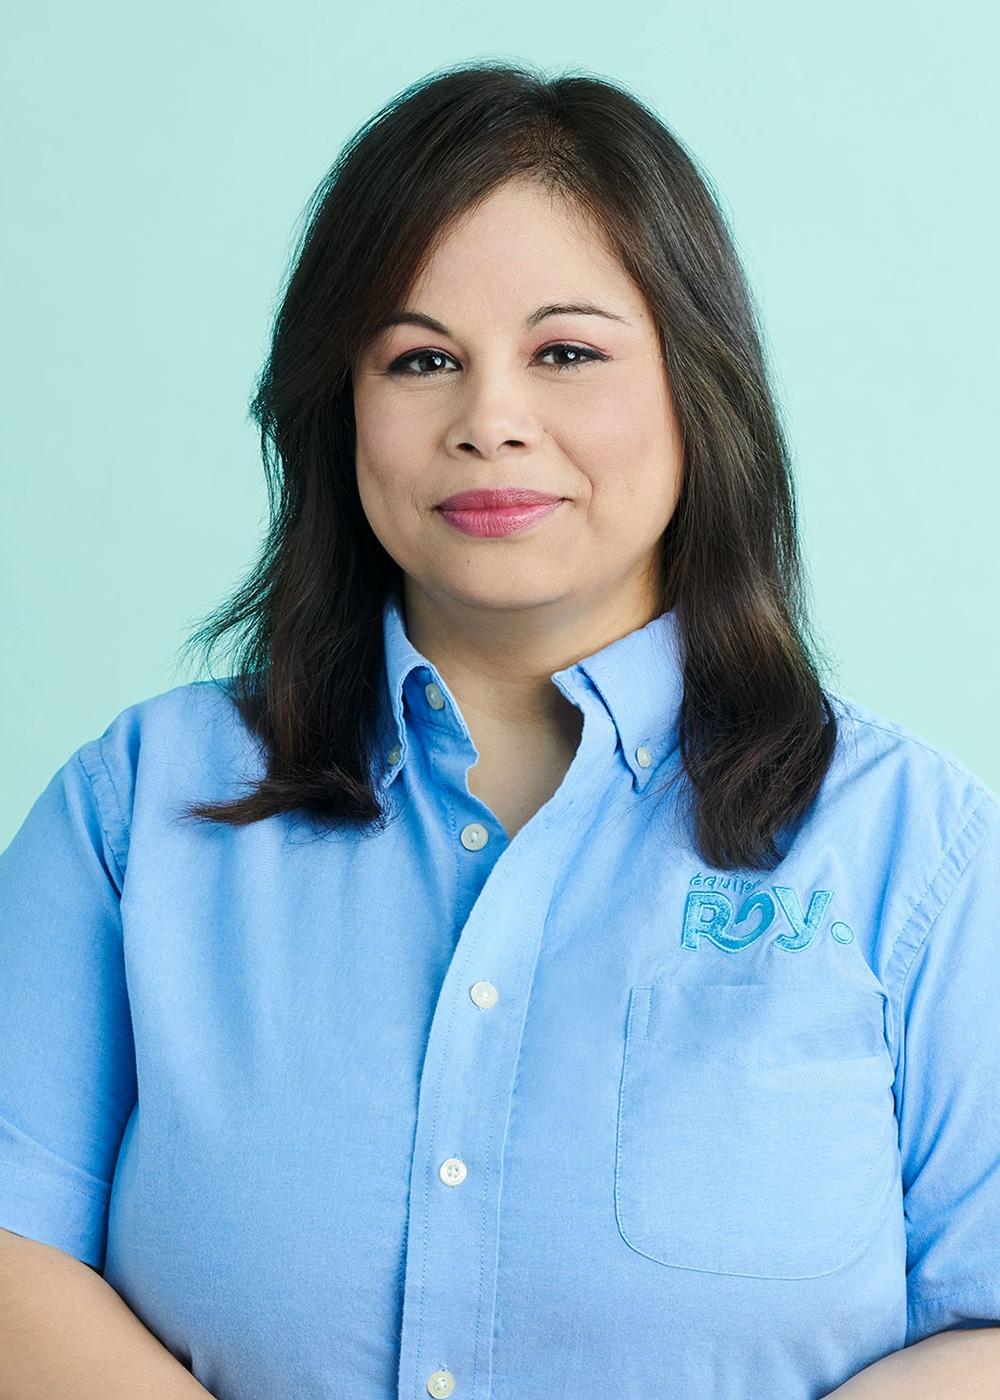 08 Ana Huerta Garcia 3871